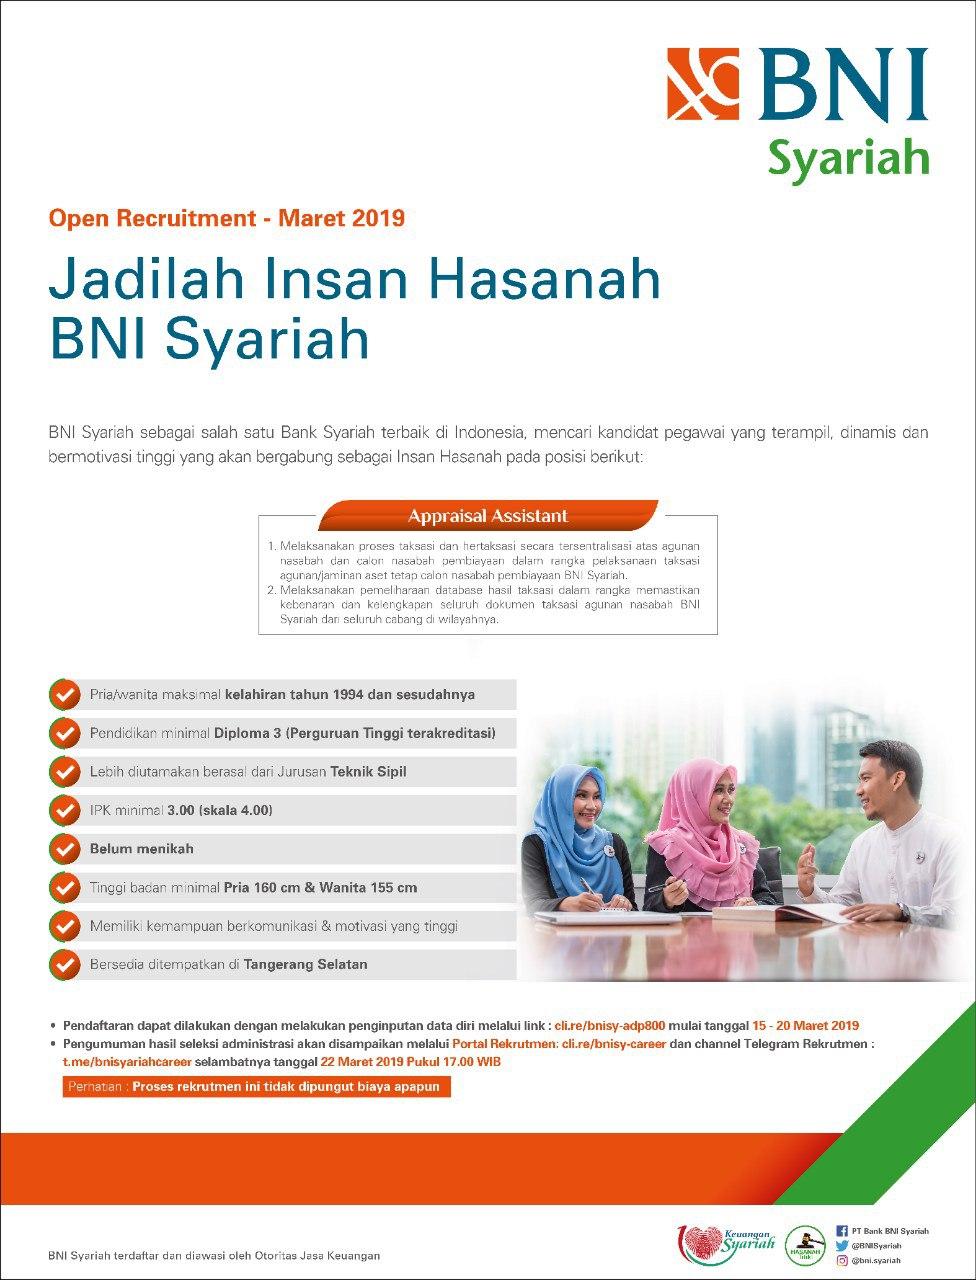 Lowongan BANK BNI SYARIAH Pendidikan minimal Diploma Tahun 2019